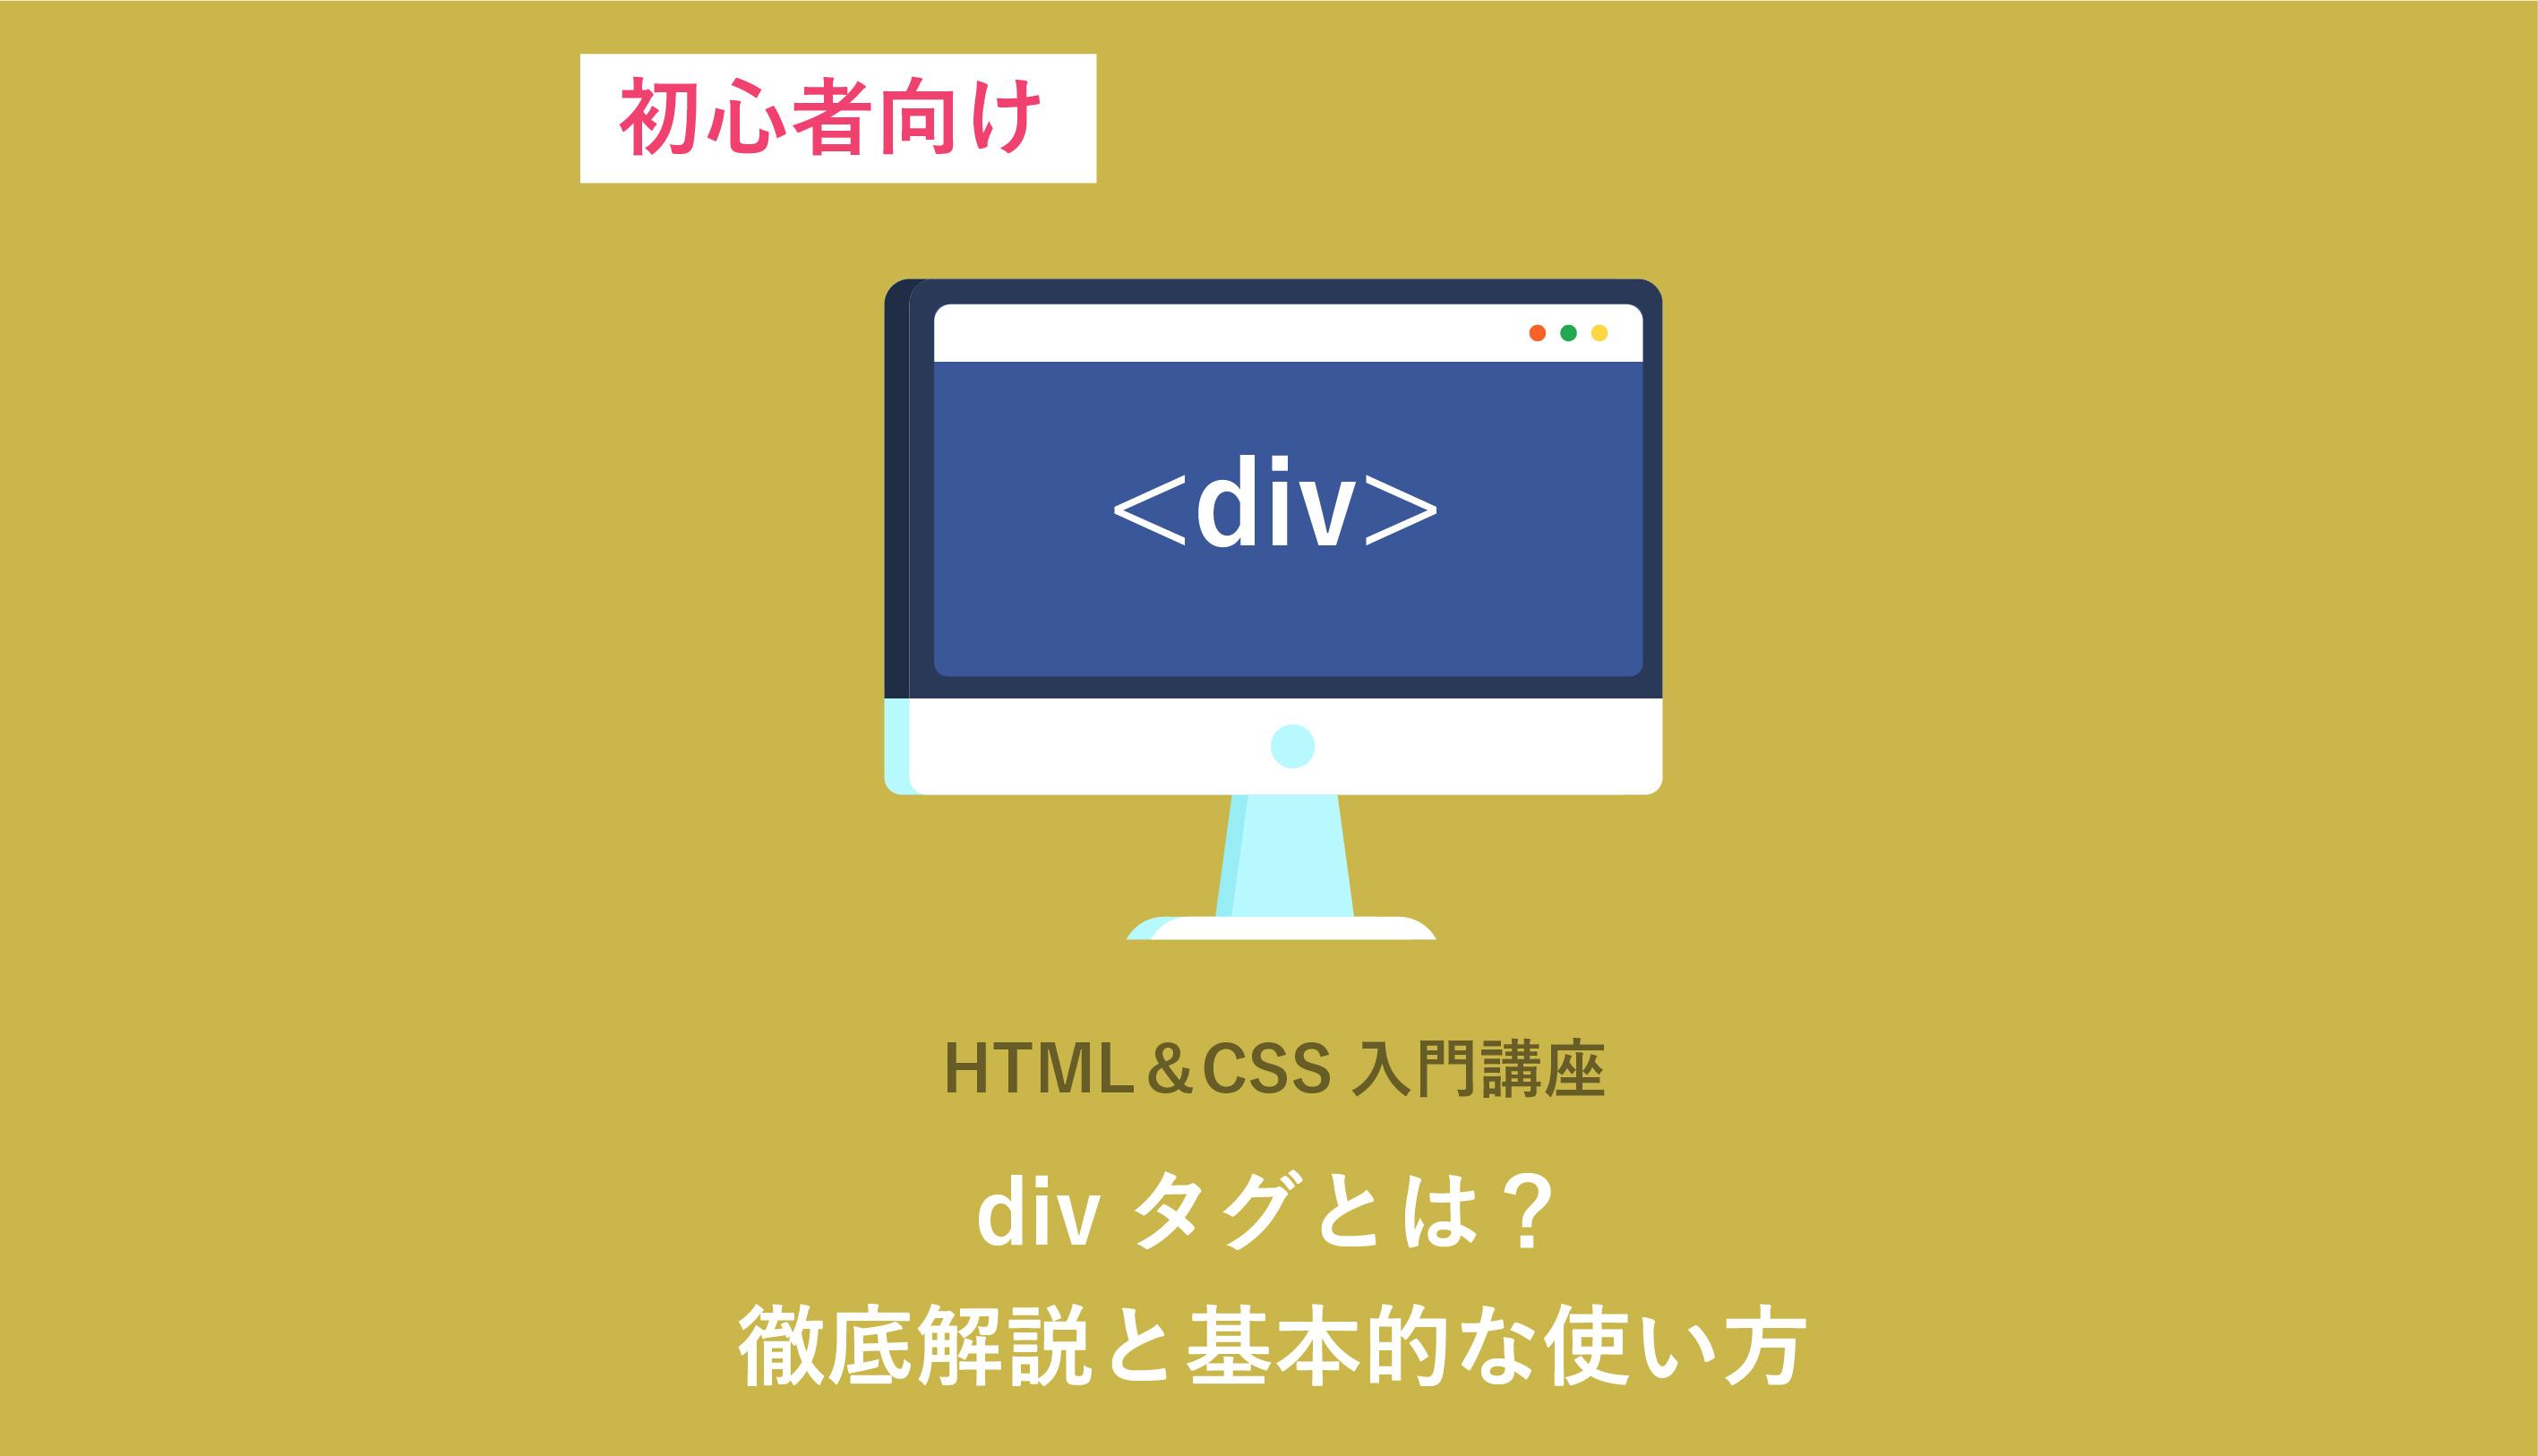 【HTML div】divタグとは?使い方を基礎から徹底解説|HTML&CSS入門